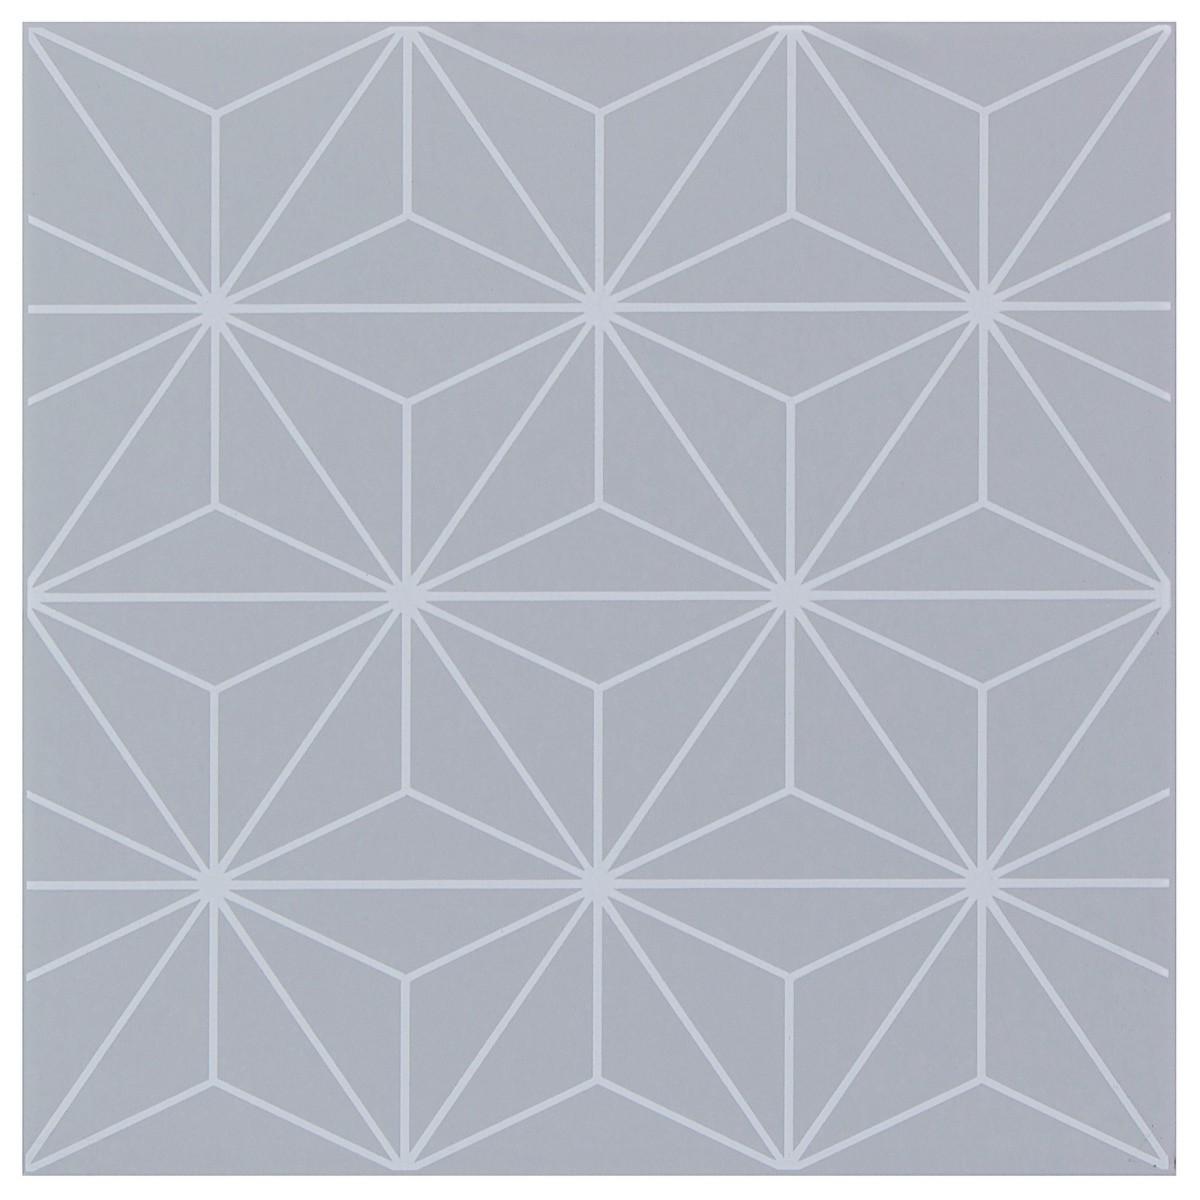 Декор «Калейдоскоп» 20х20 см цвет серый